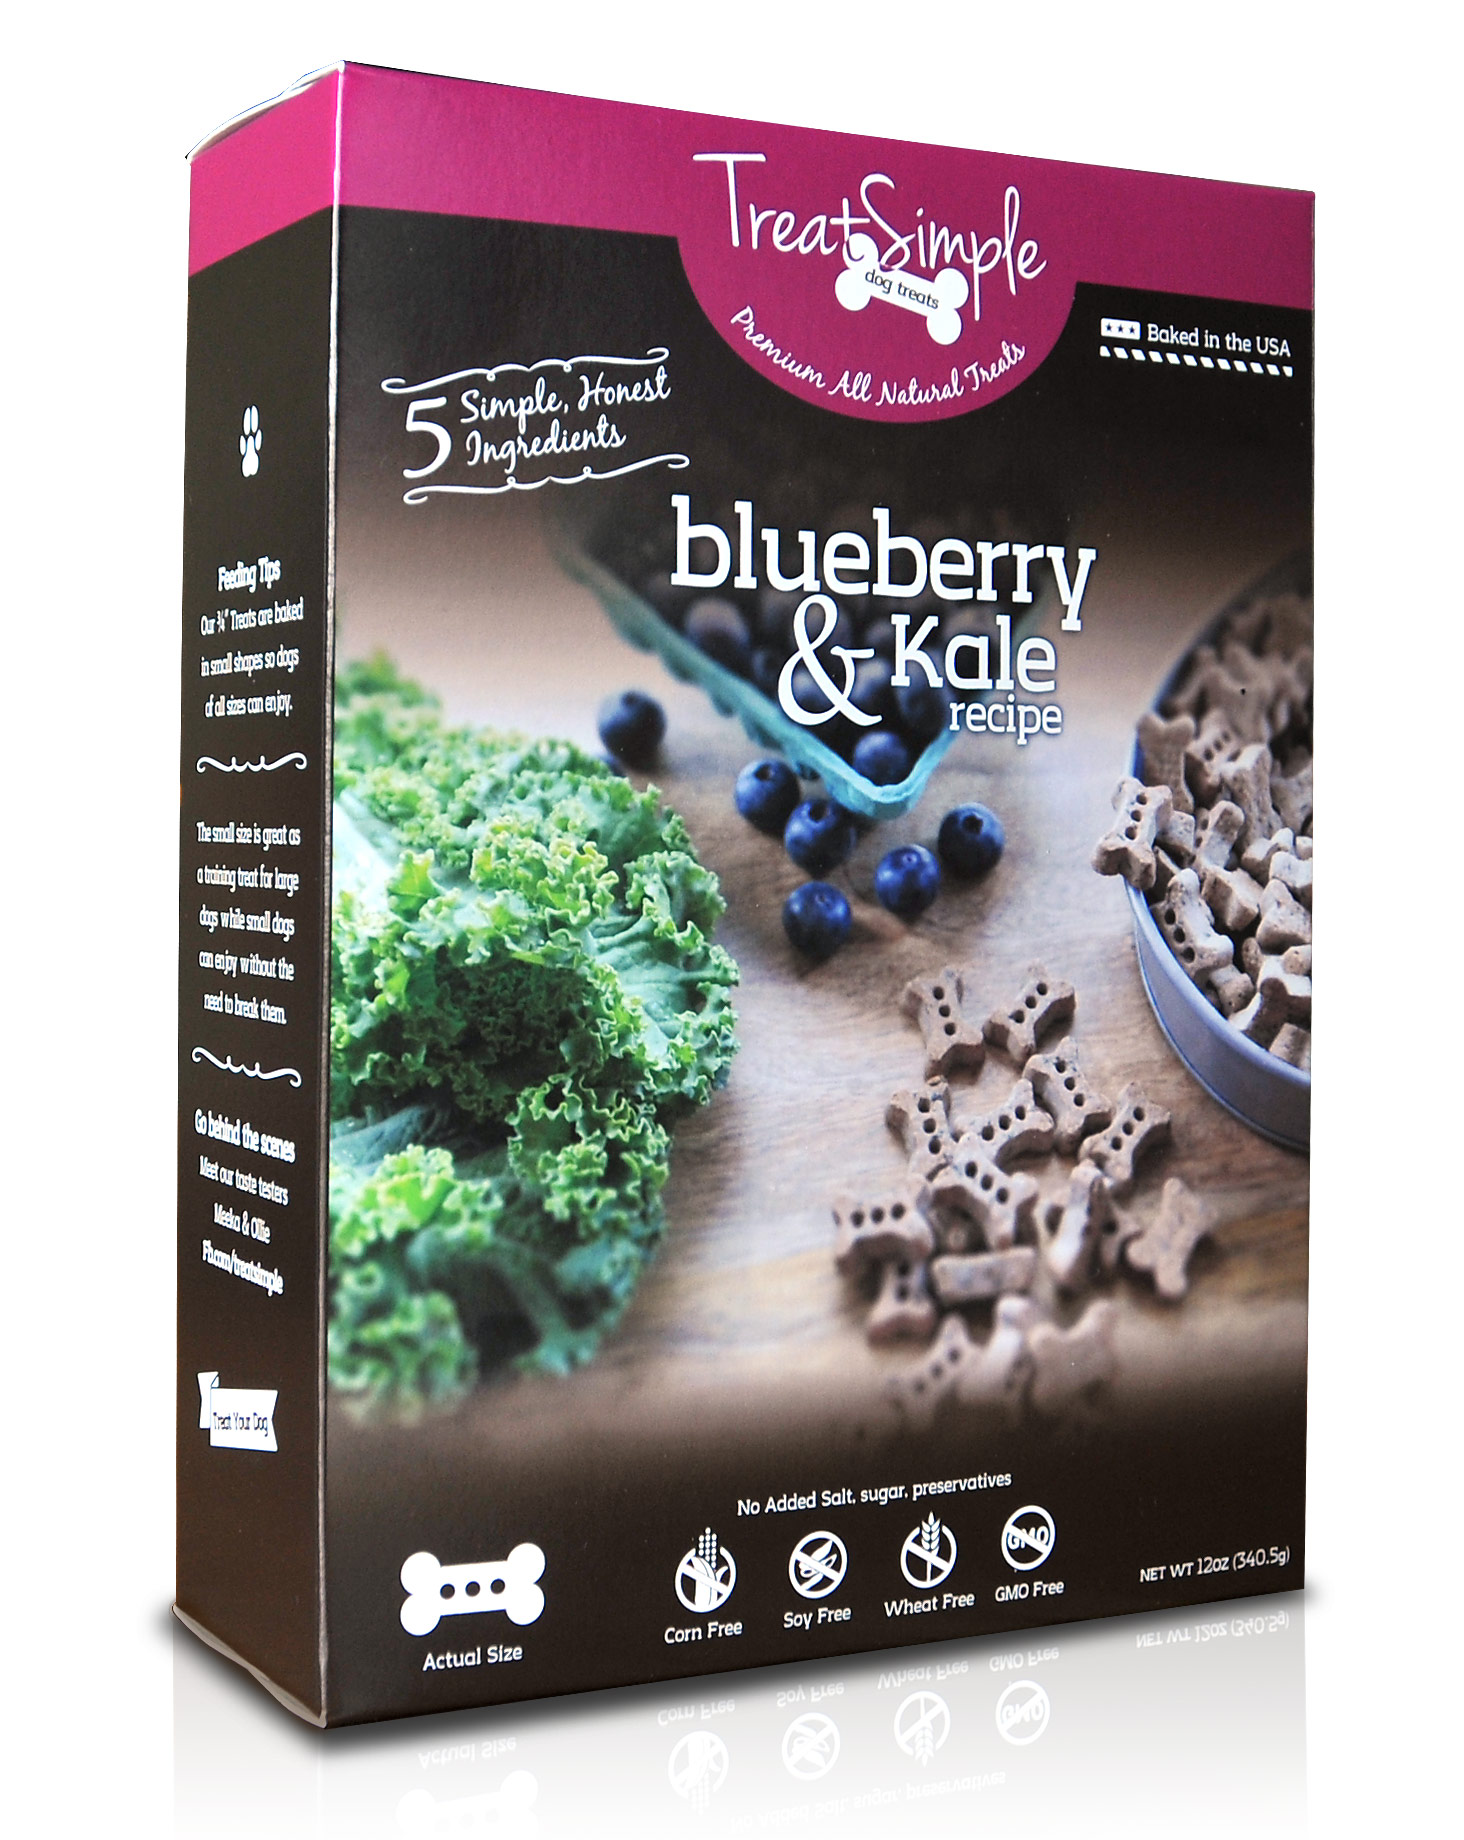 blueberry_box_lg.jpg